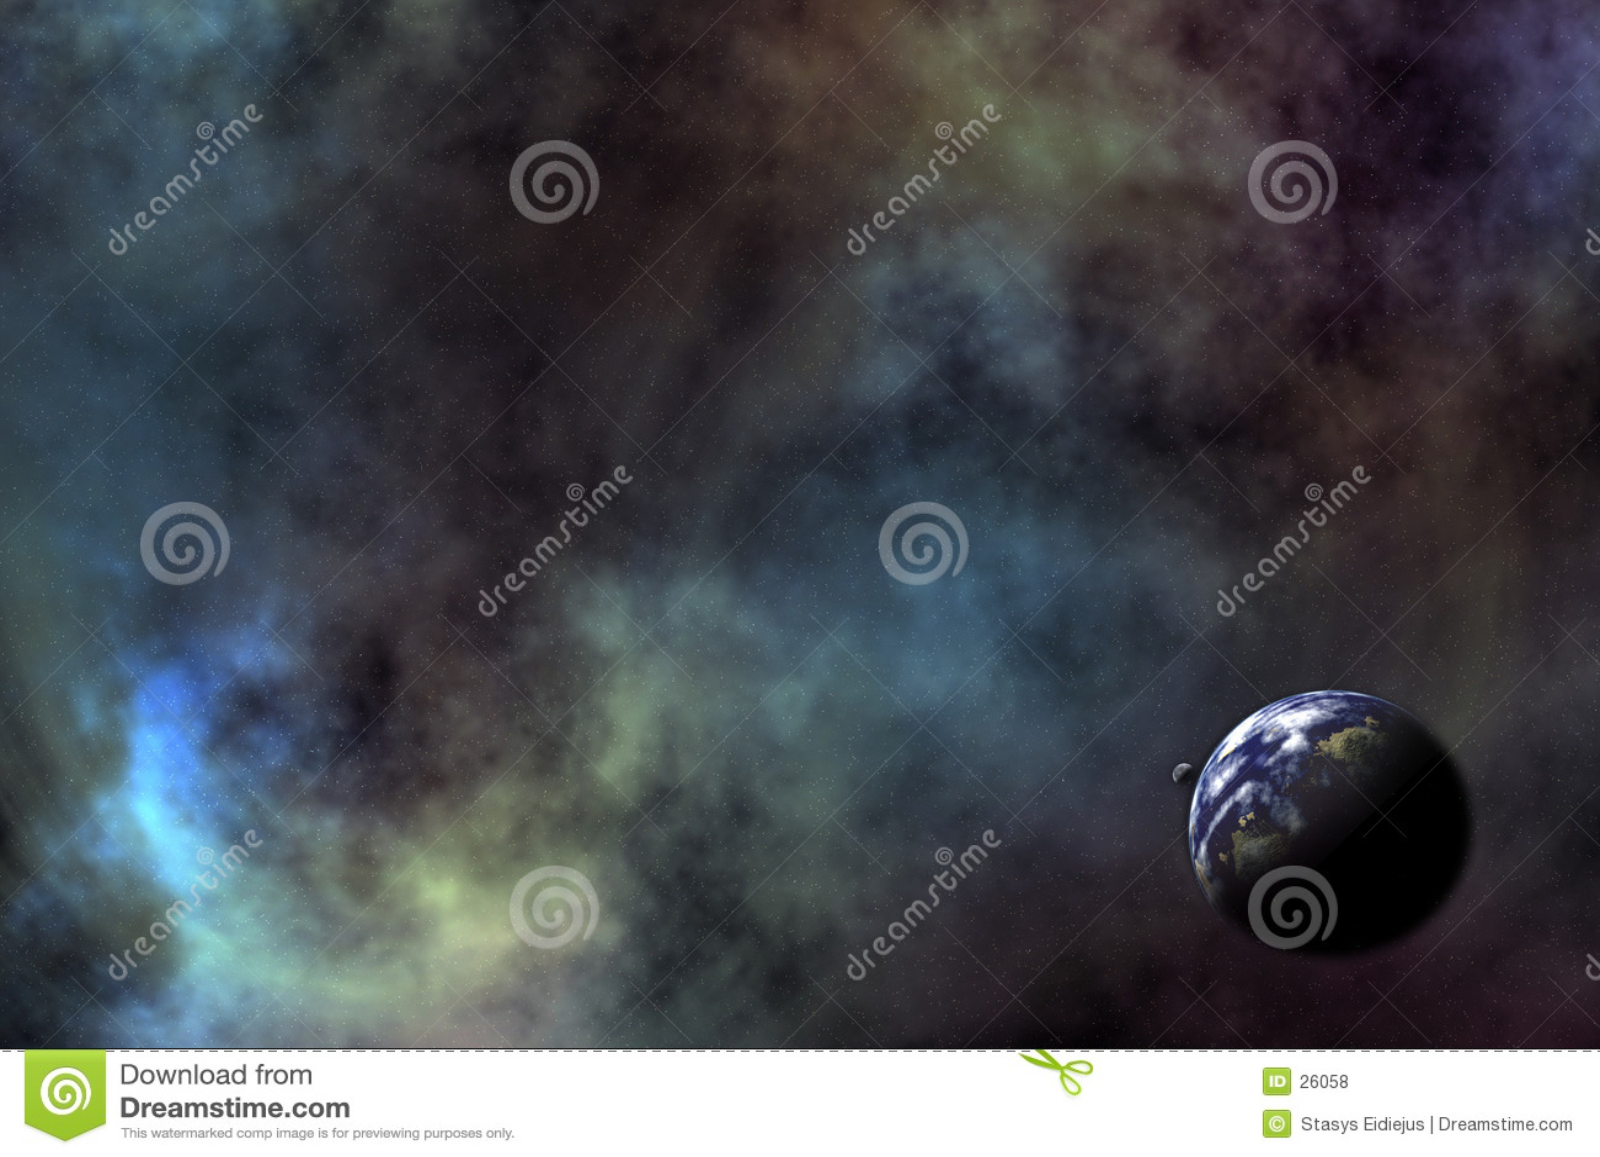 Space scenario II